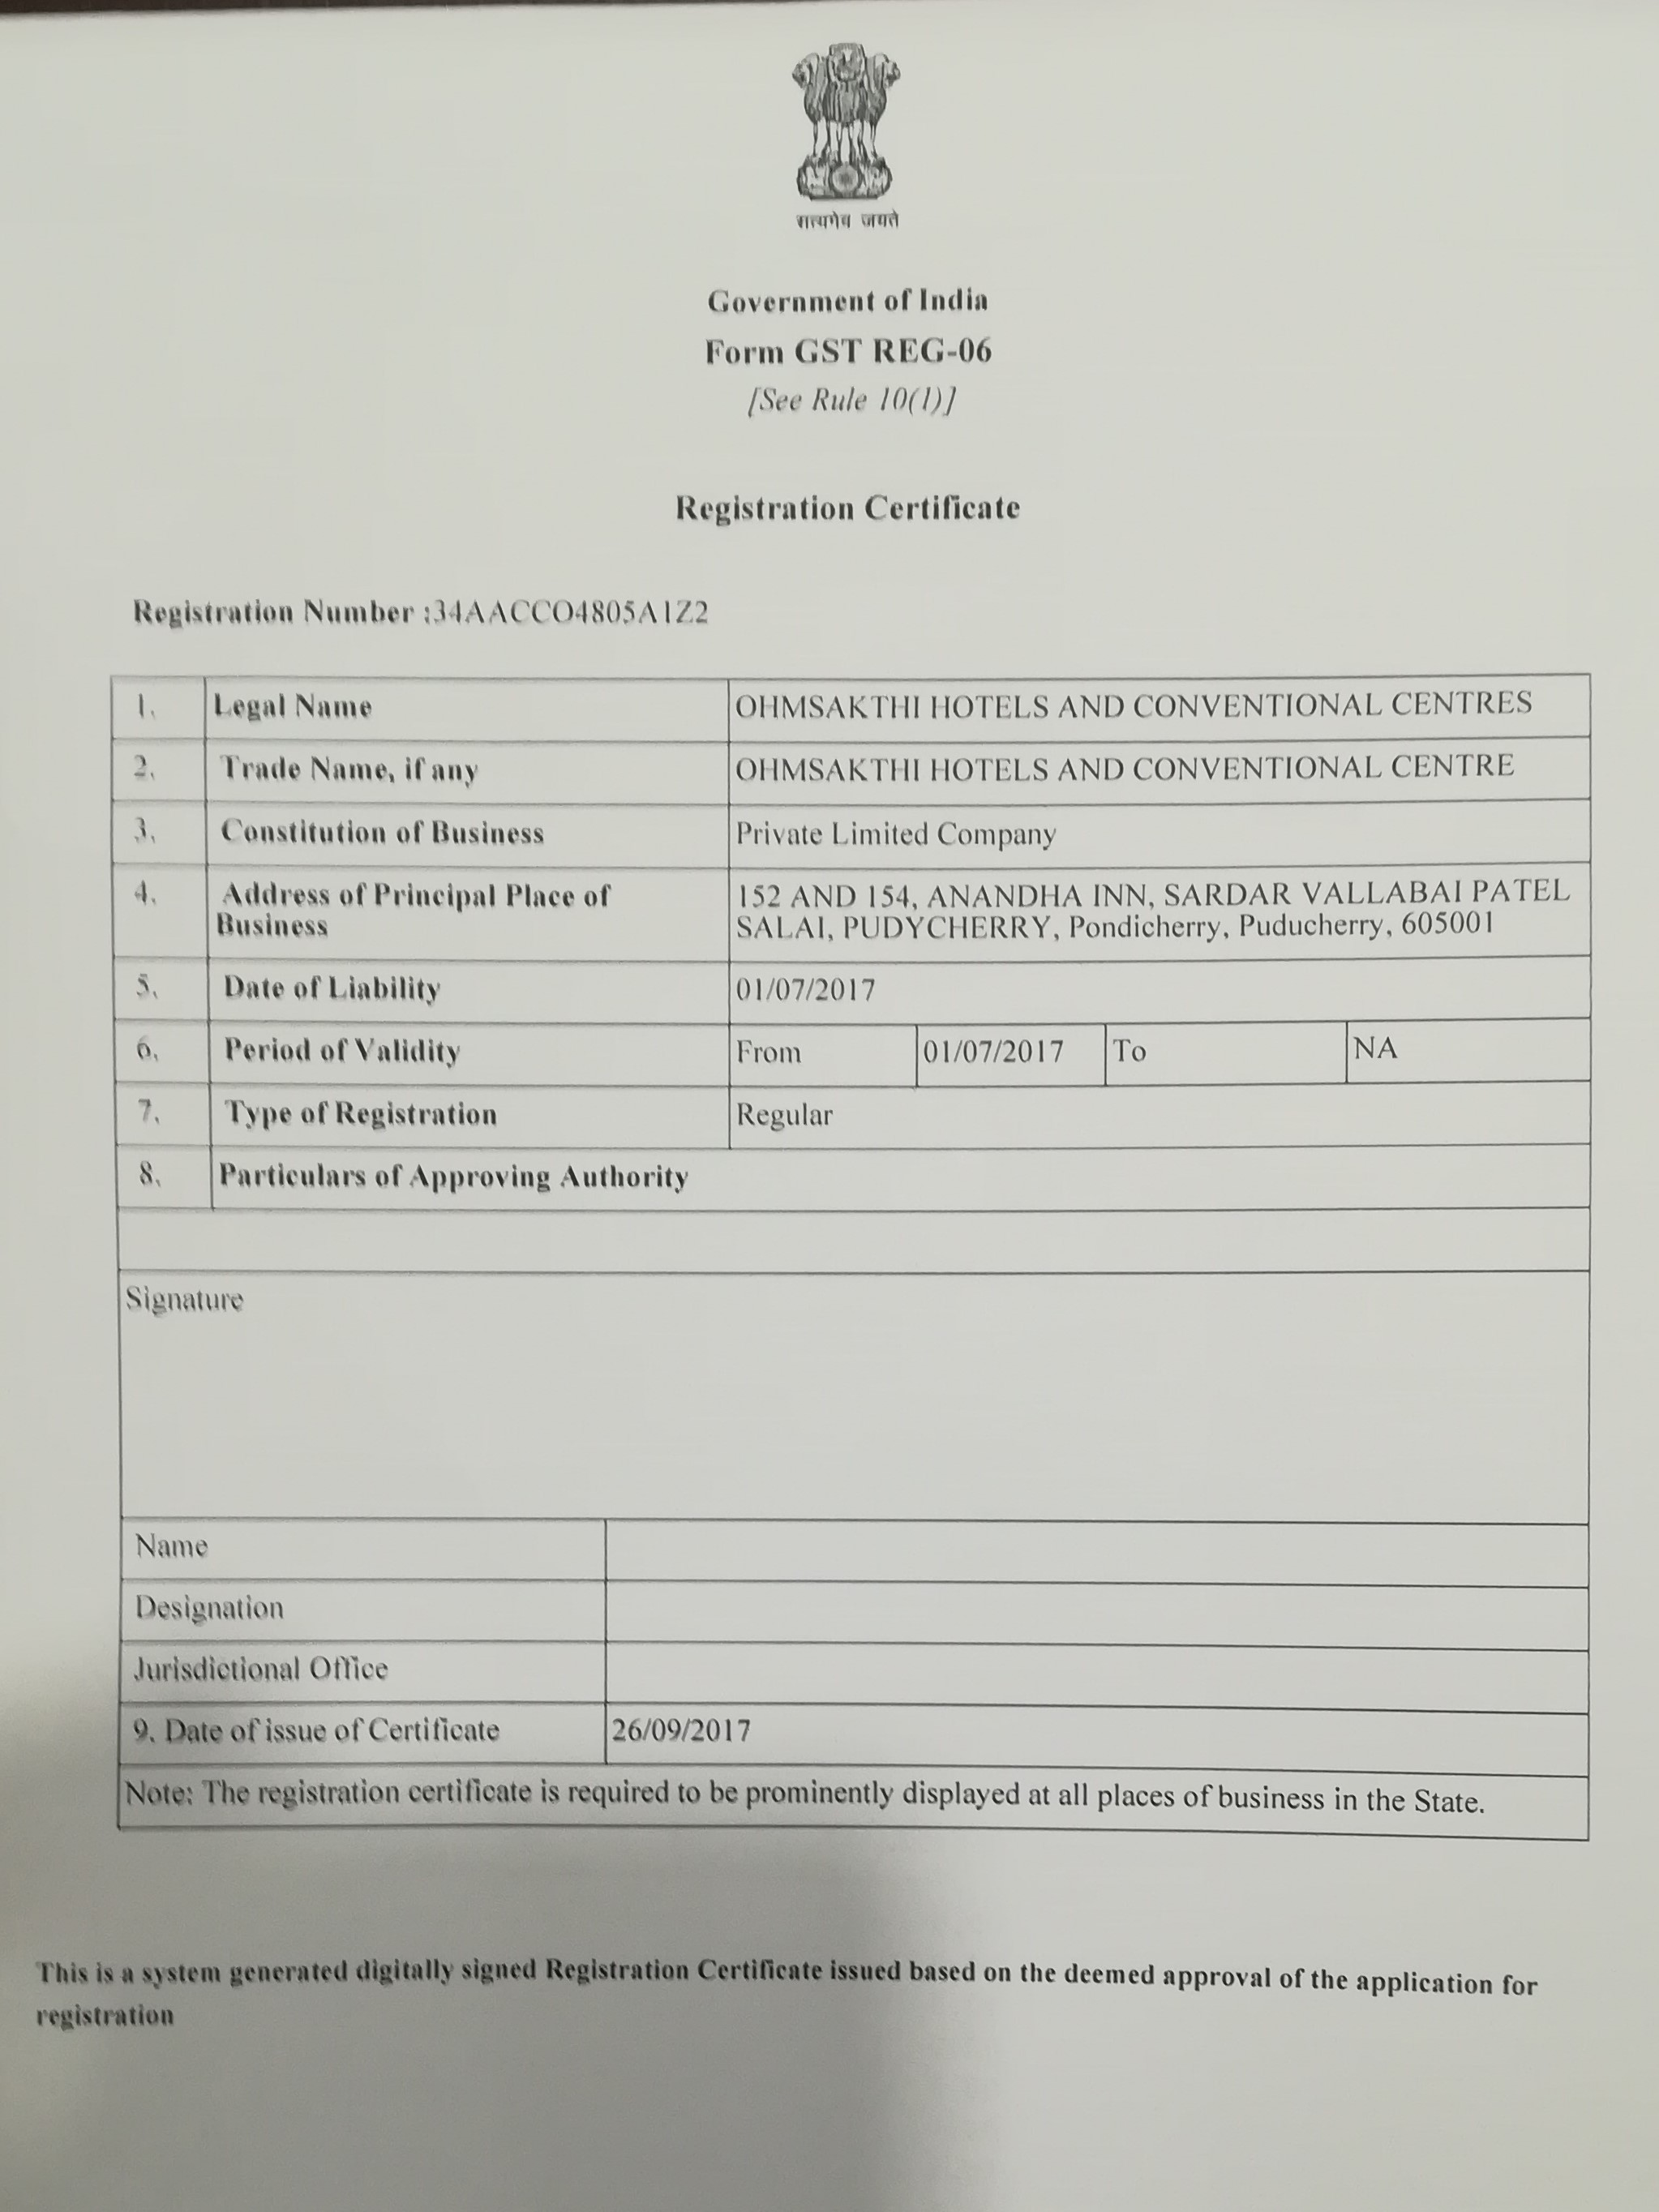 www fhrai com - /Files/GSTAttachment/